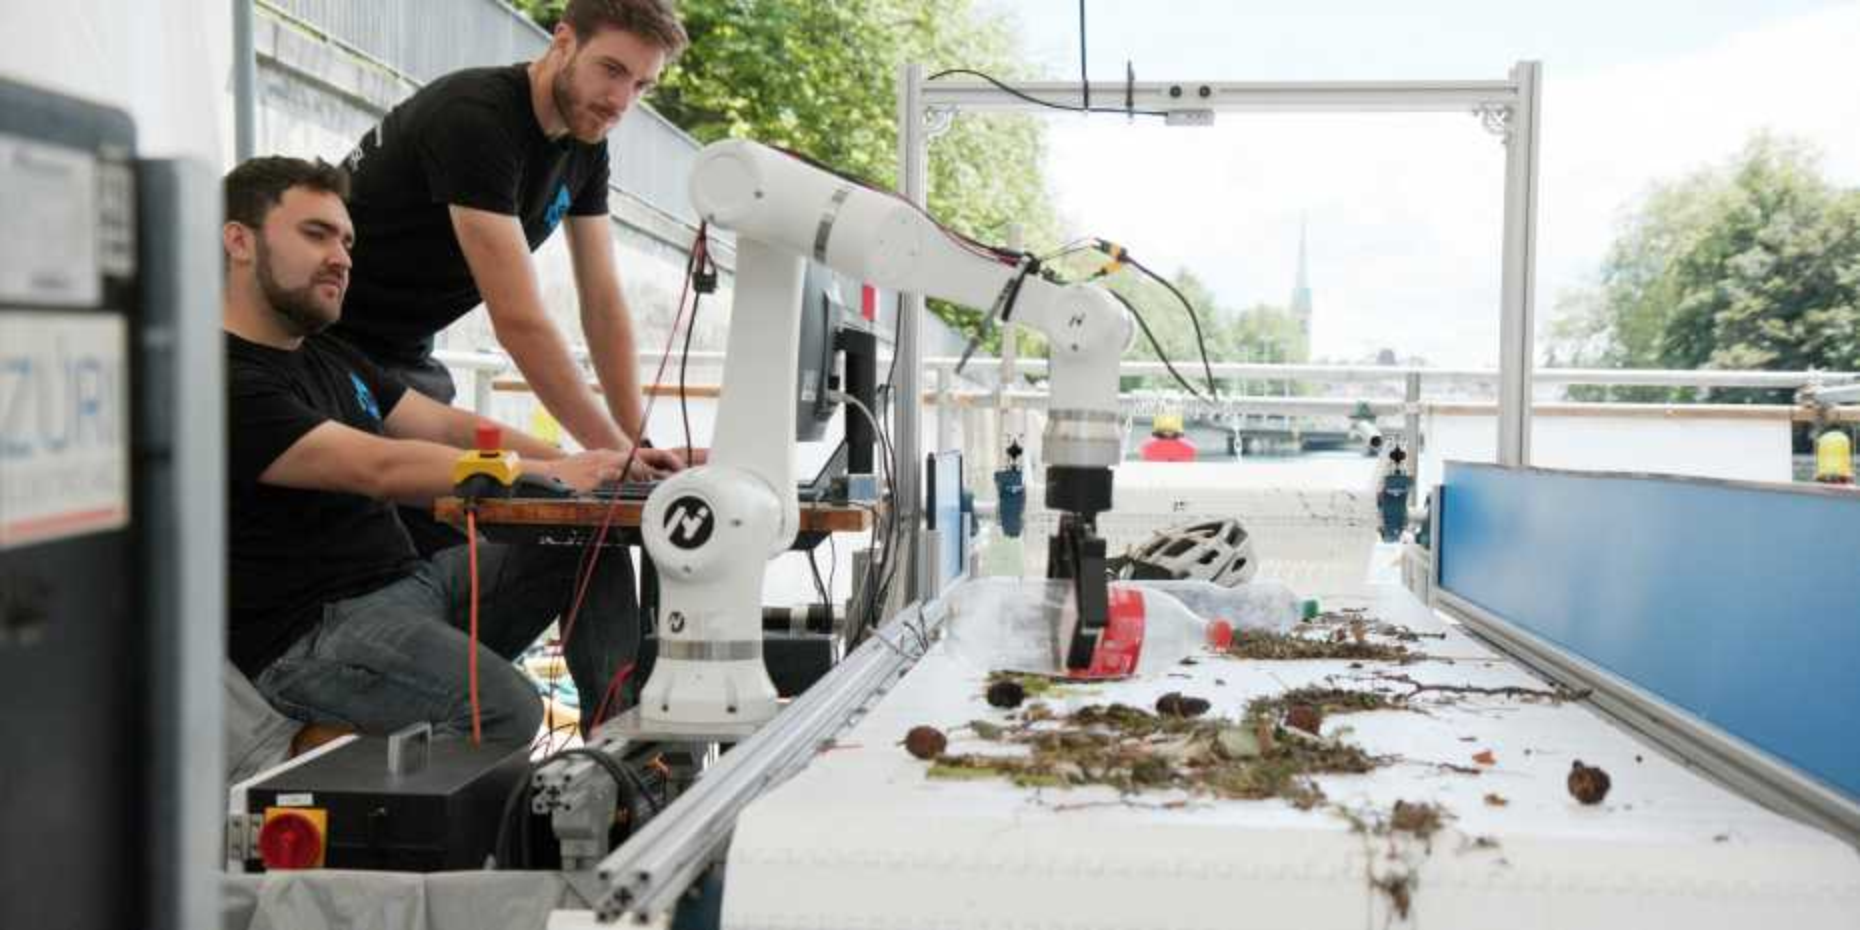 Robot removing plastics